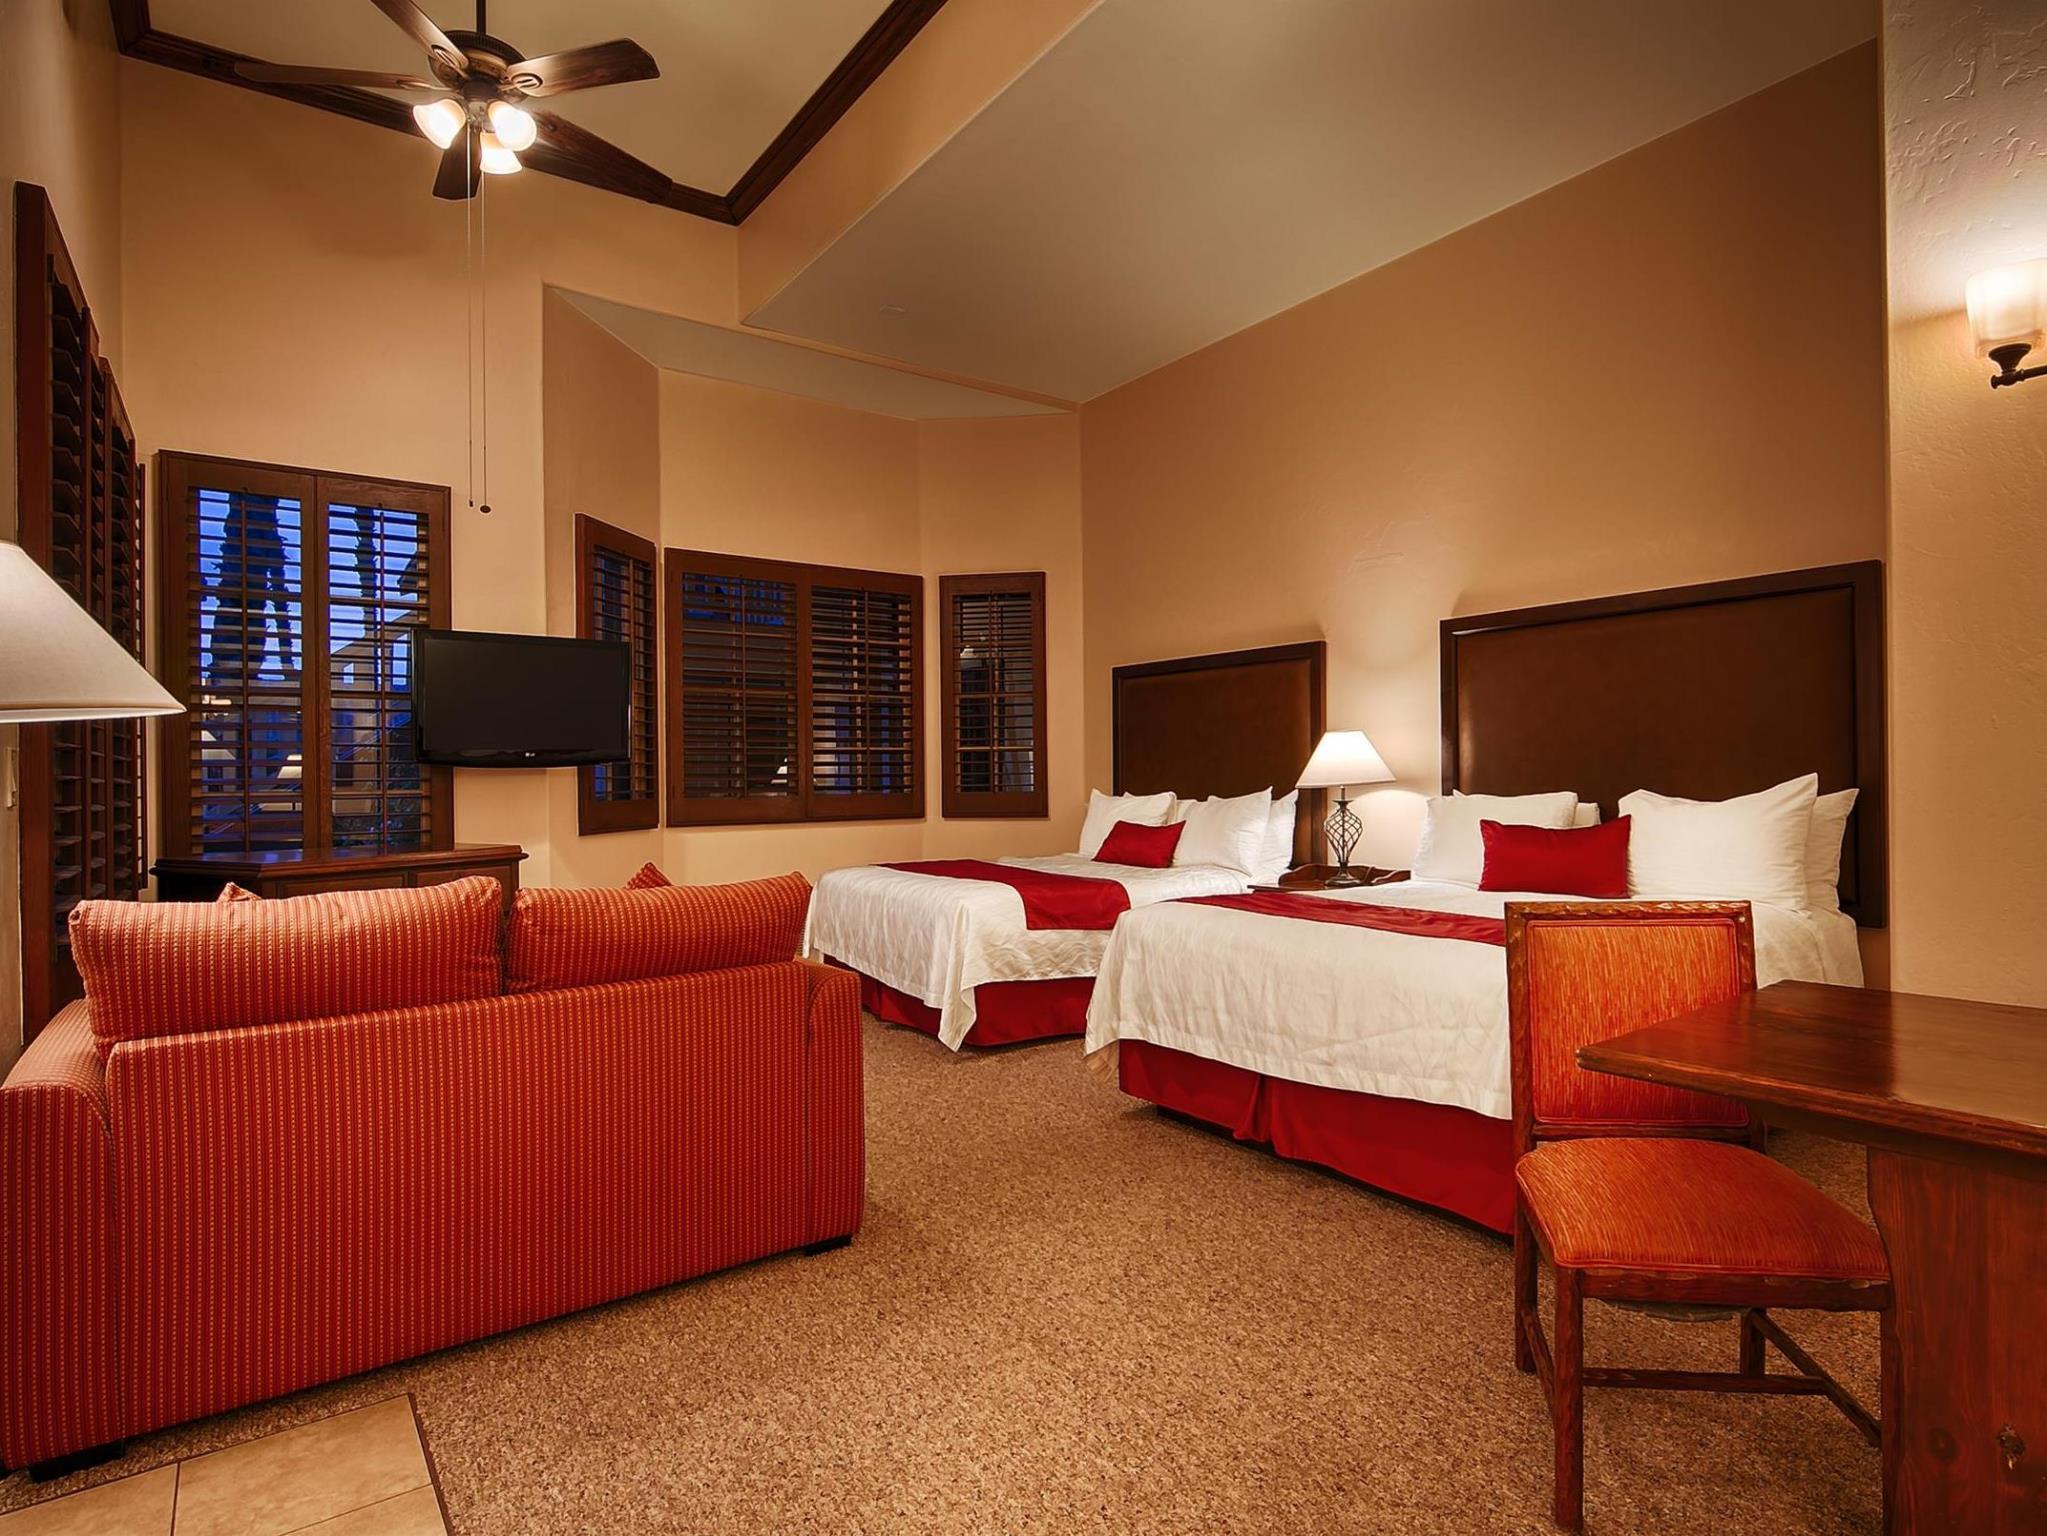 Best Price on Best Western Plus Hacienda Hotel Old Town in San